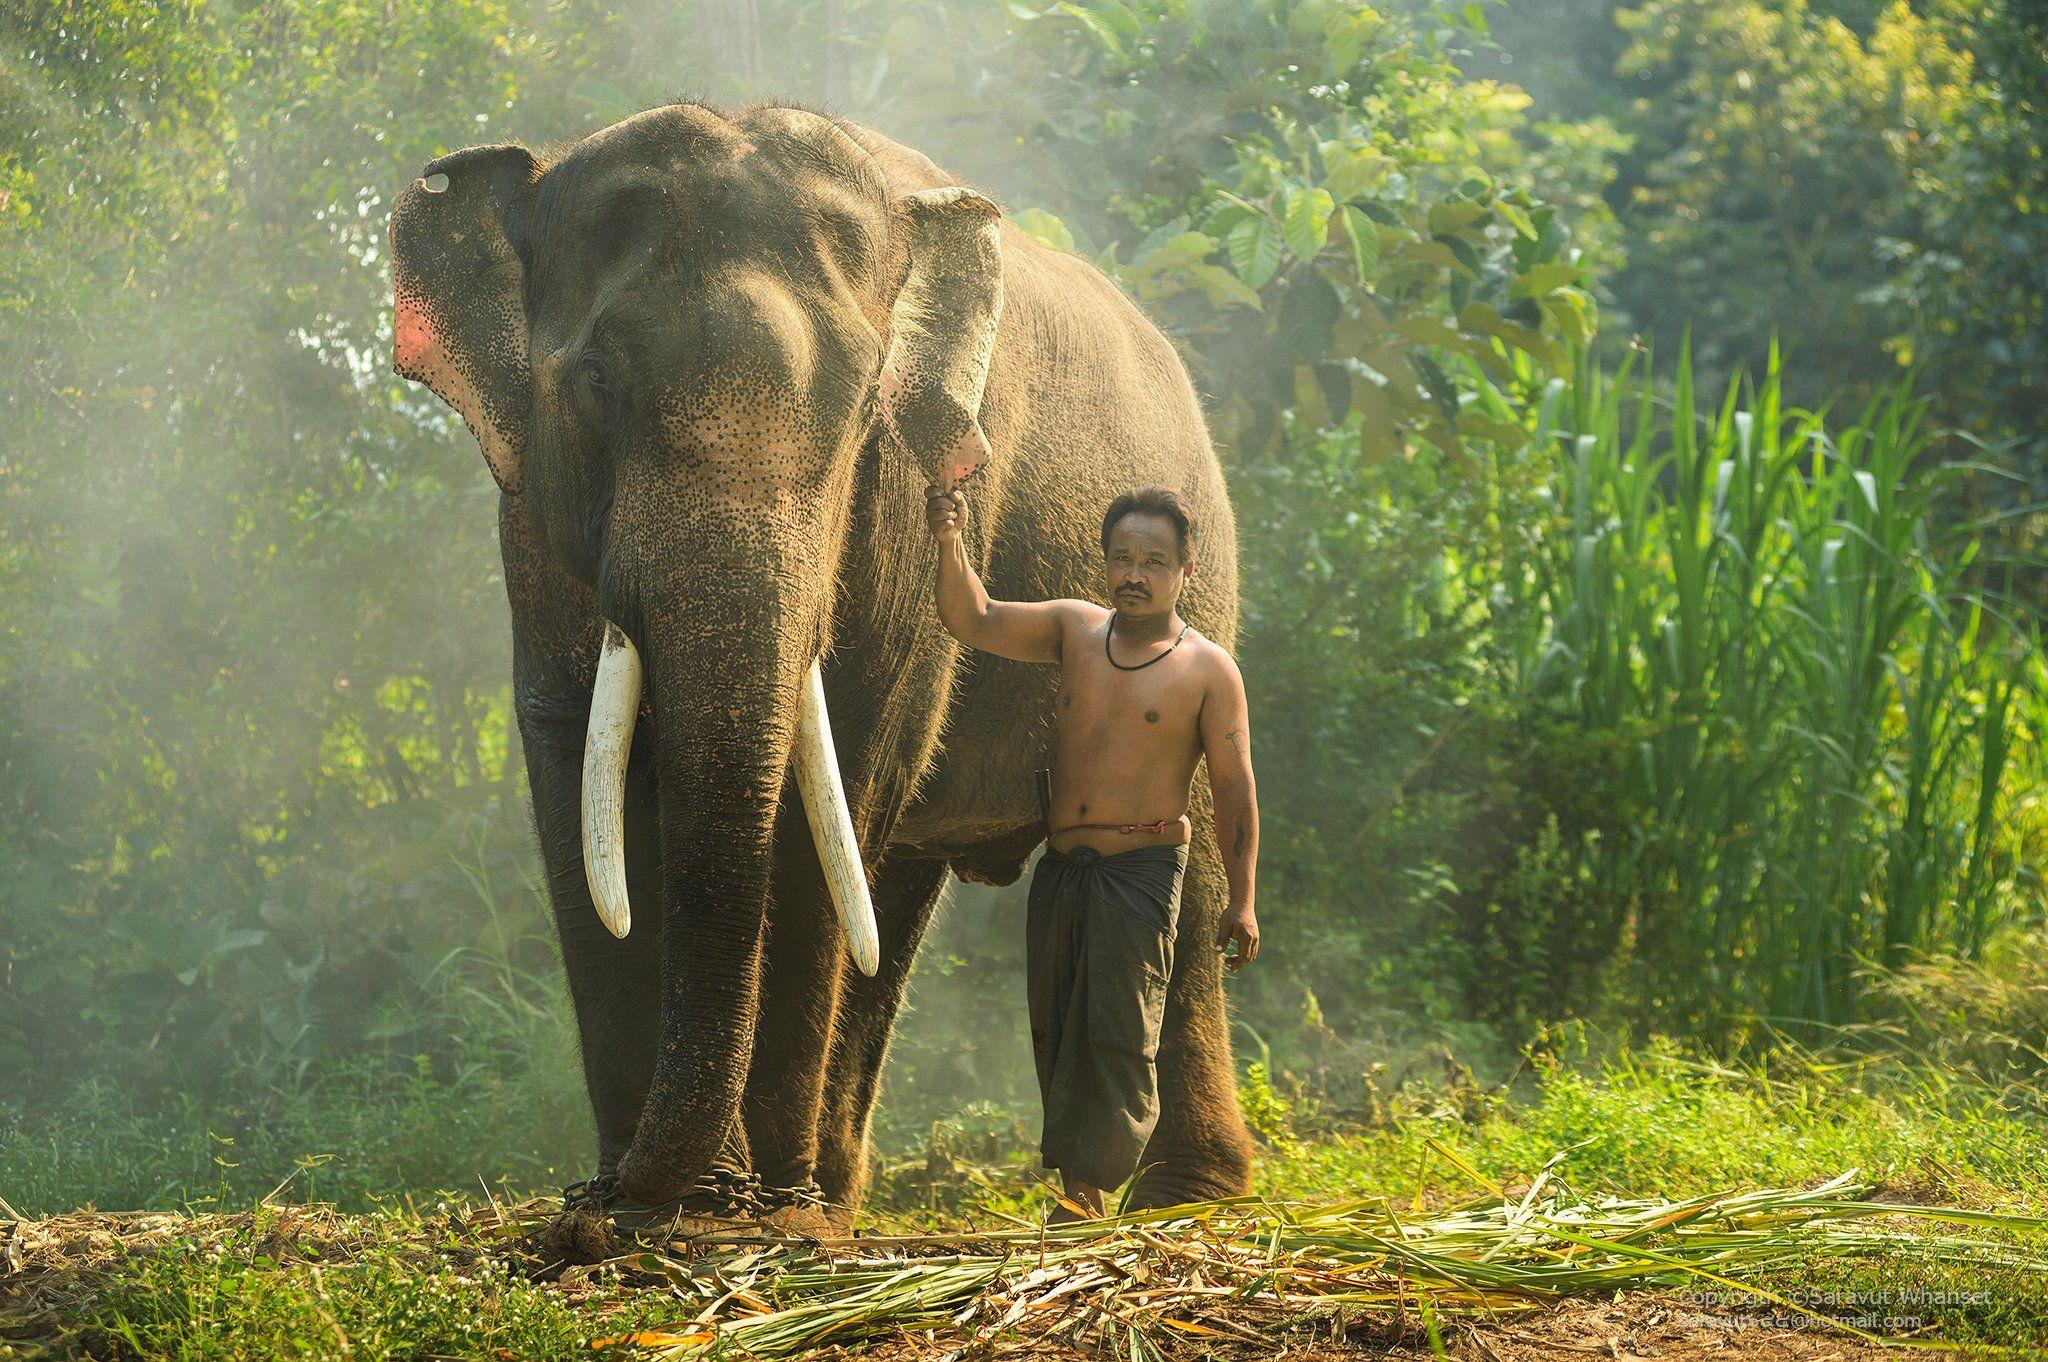 Animals, Asia, Asian, Culture, Elephant, Green, Journey, People, Photo, Photography, Thai, Thailand, Tour, Touring, Travel, Saravut Whanset